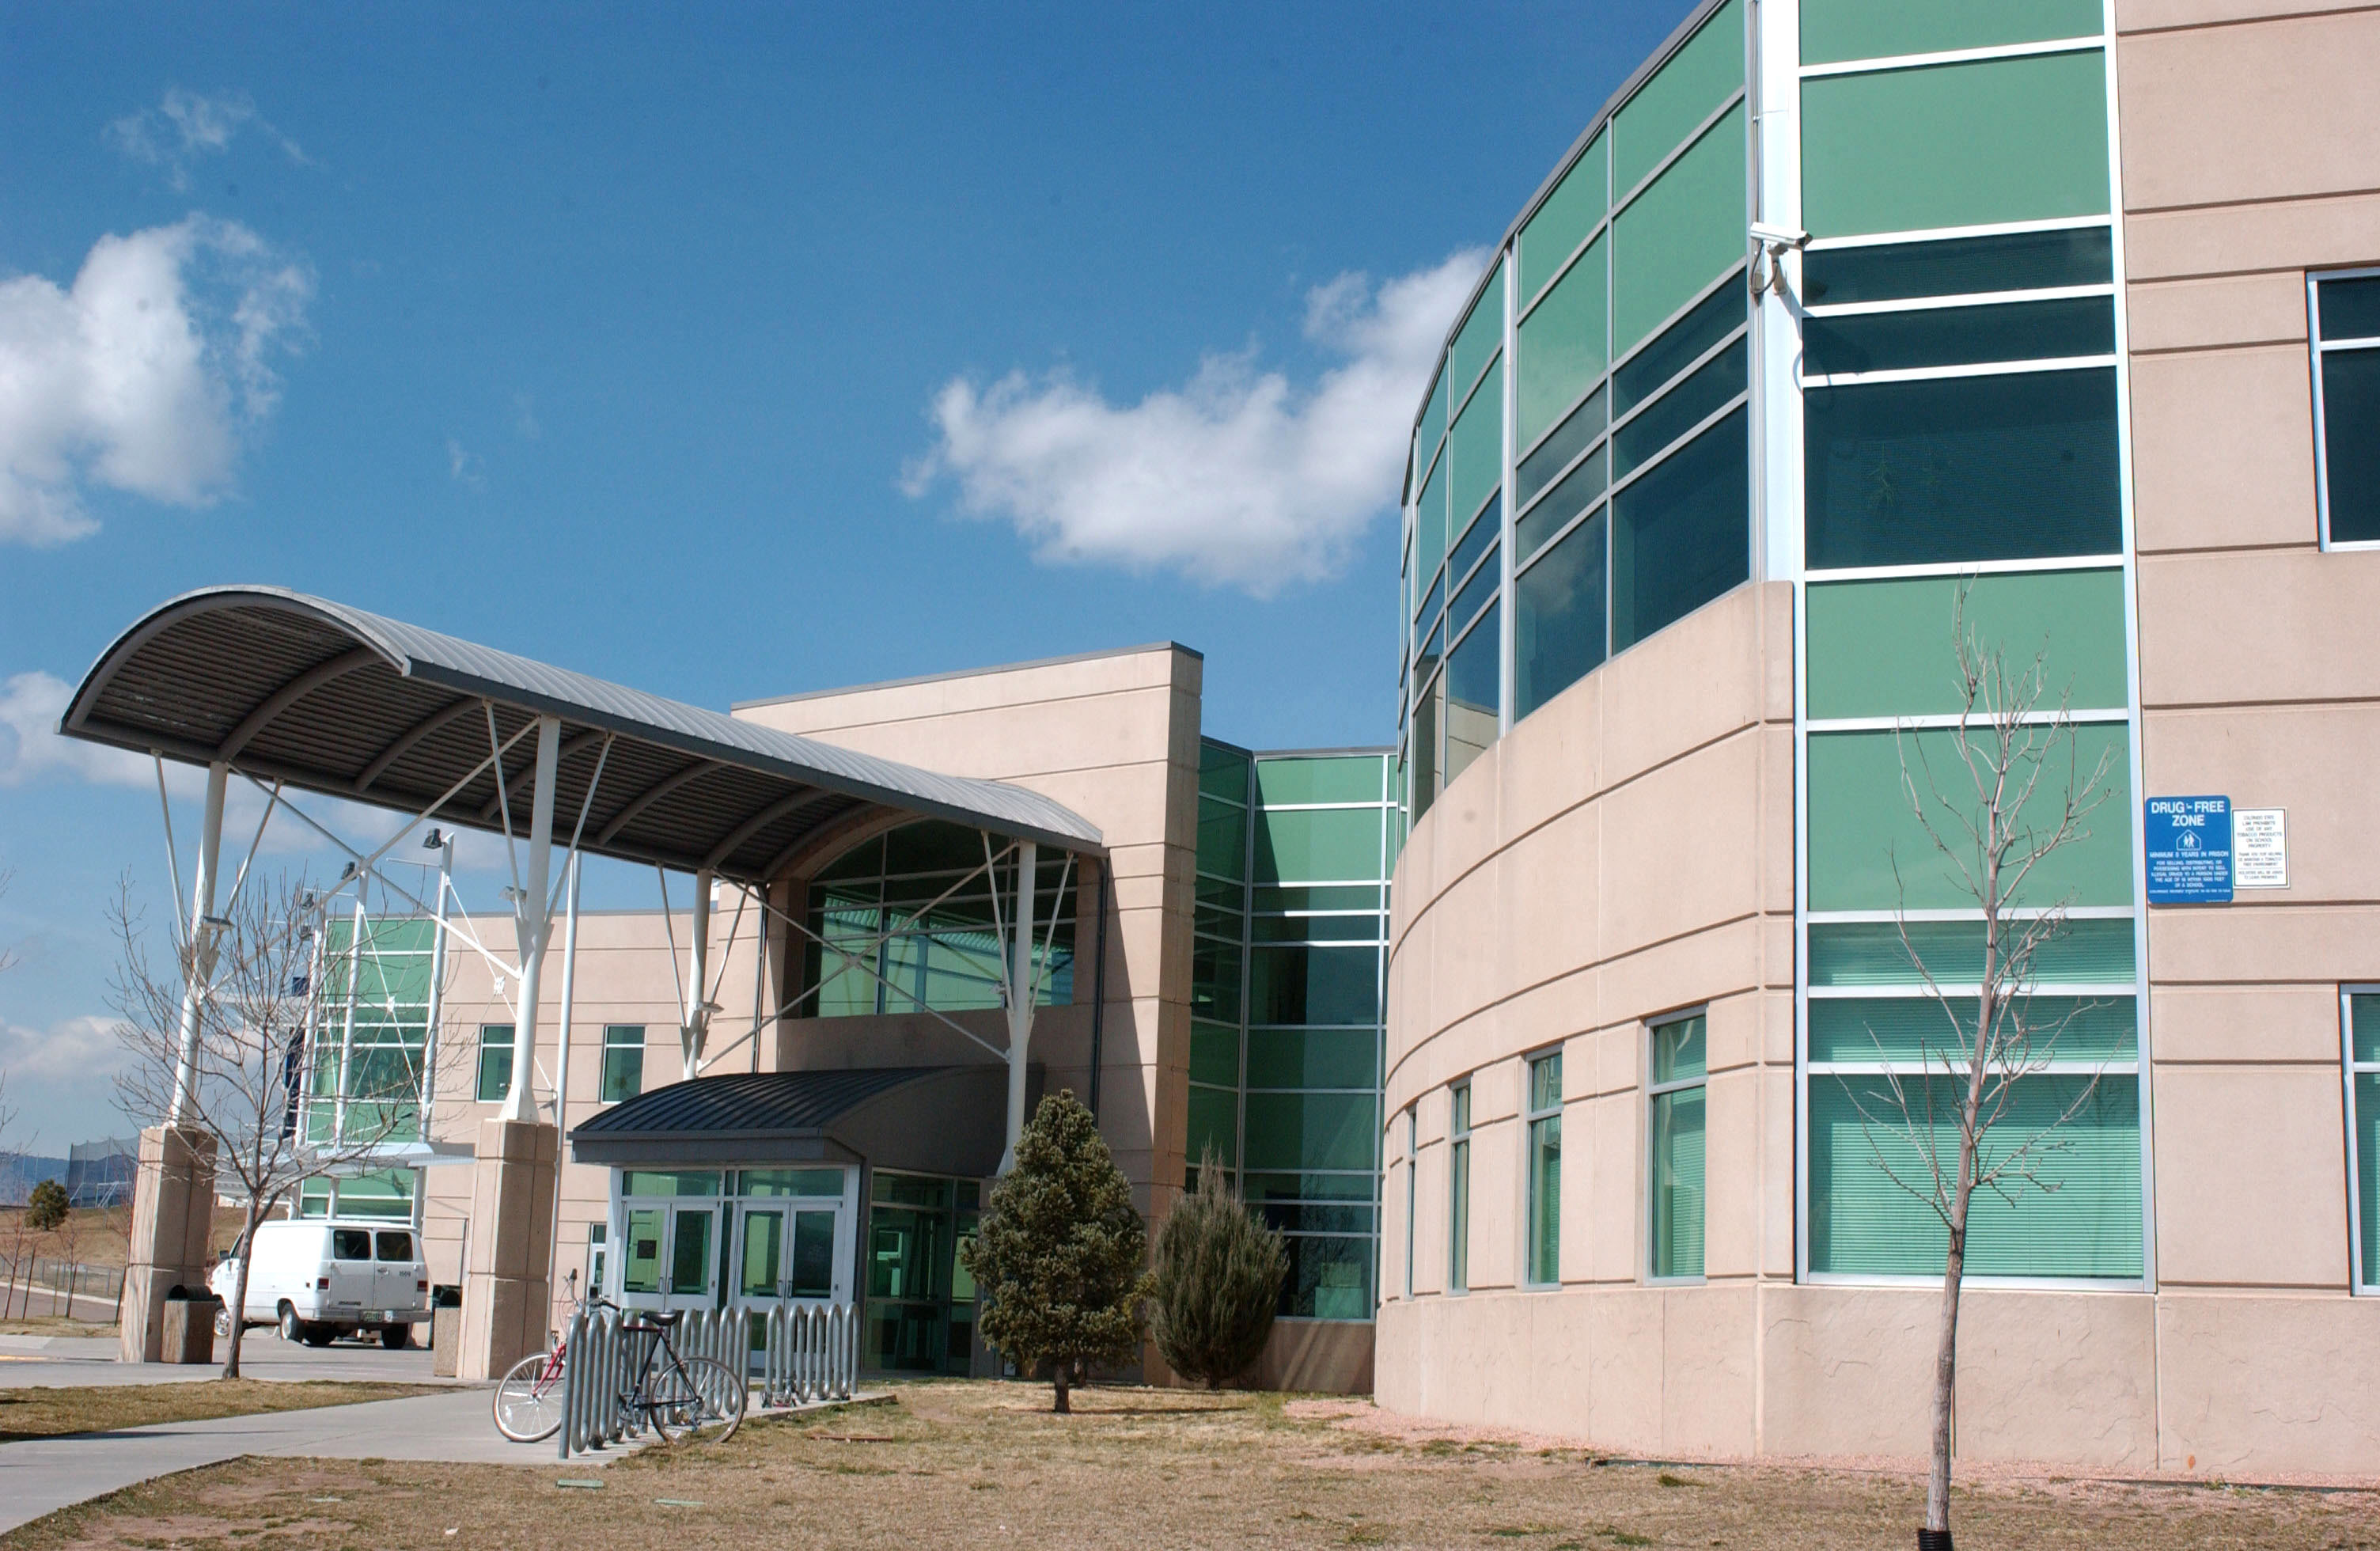 columbine high school on lockout after phone threats